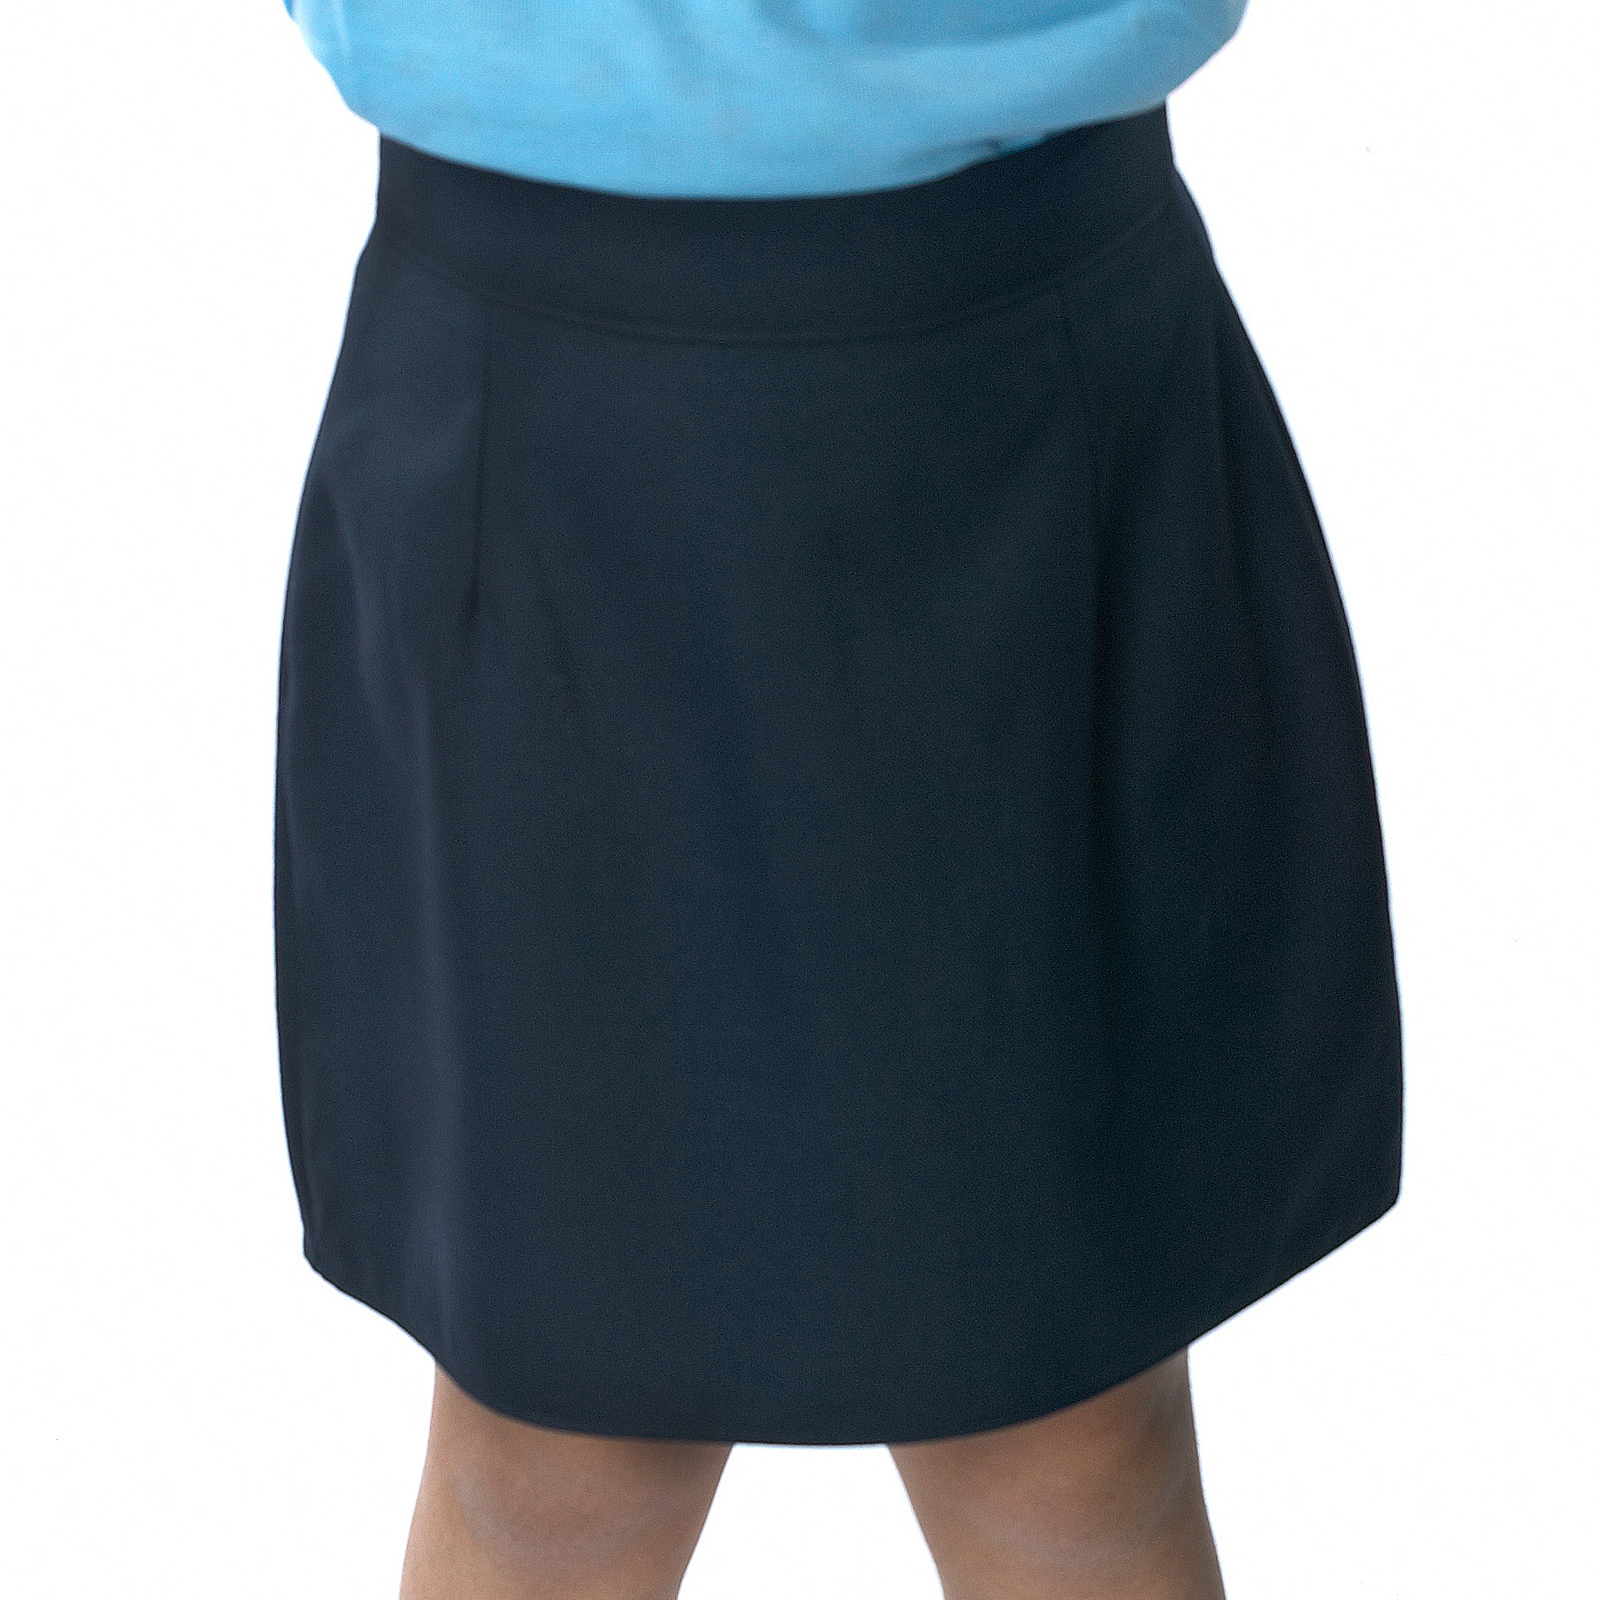 new only bangleen pencil skirt school skirts